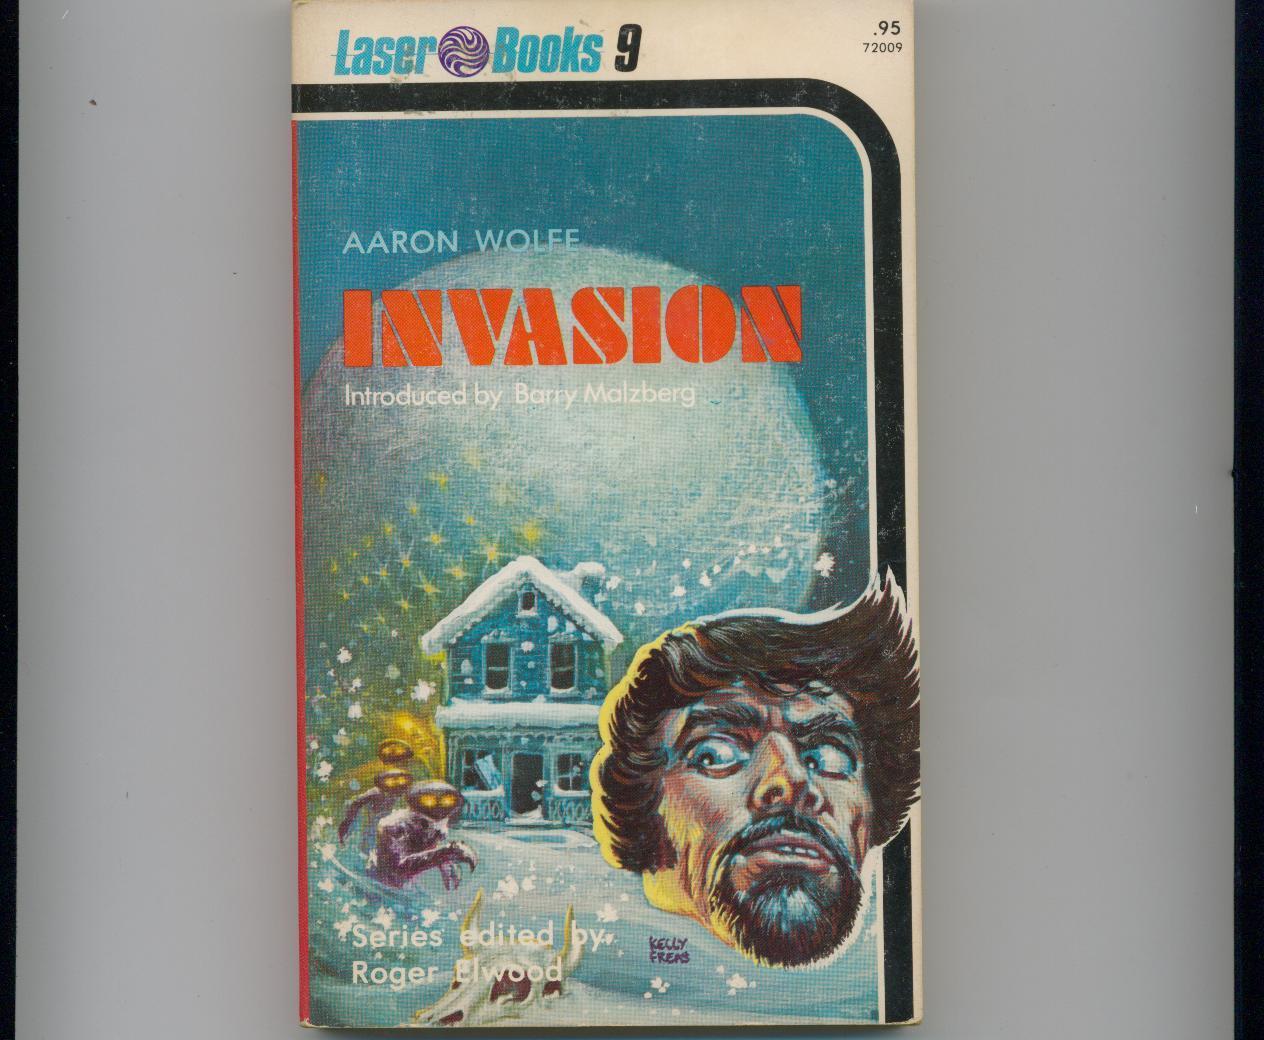 Koontz (as Wolfe) - INVASION - 1975 - 1st pr. - Laser Books